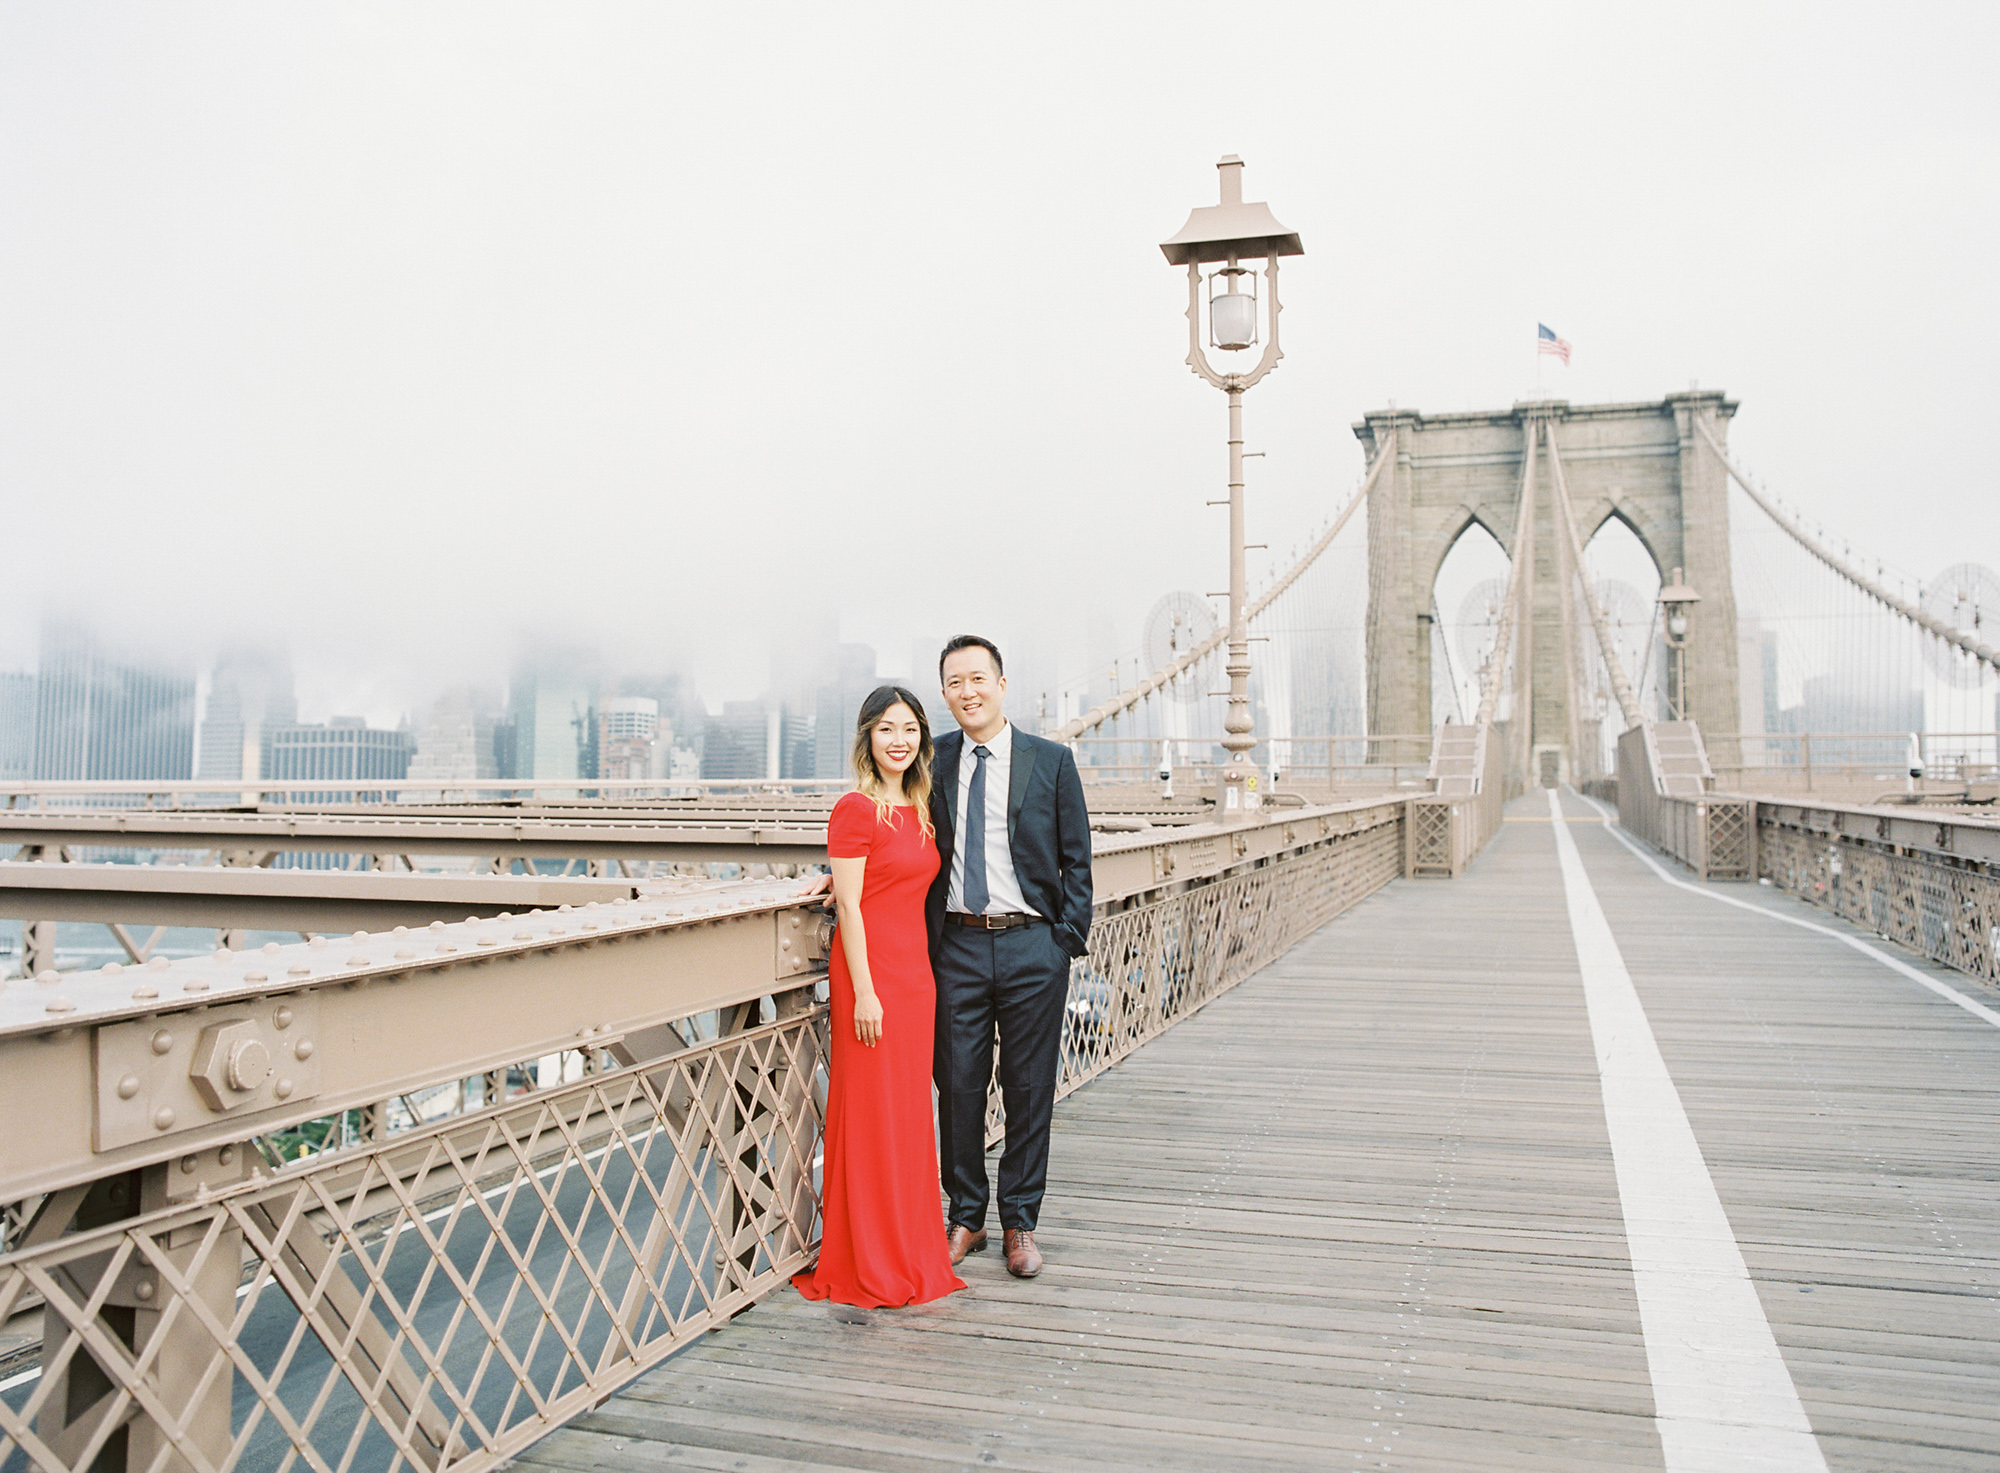 New-York-Film-Engagement-Session-Brooklyn-Bridge-Central-Park-5.jpg